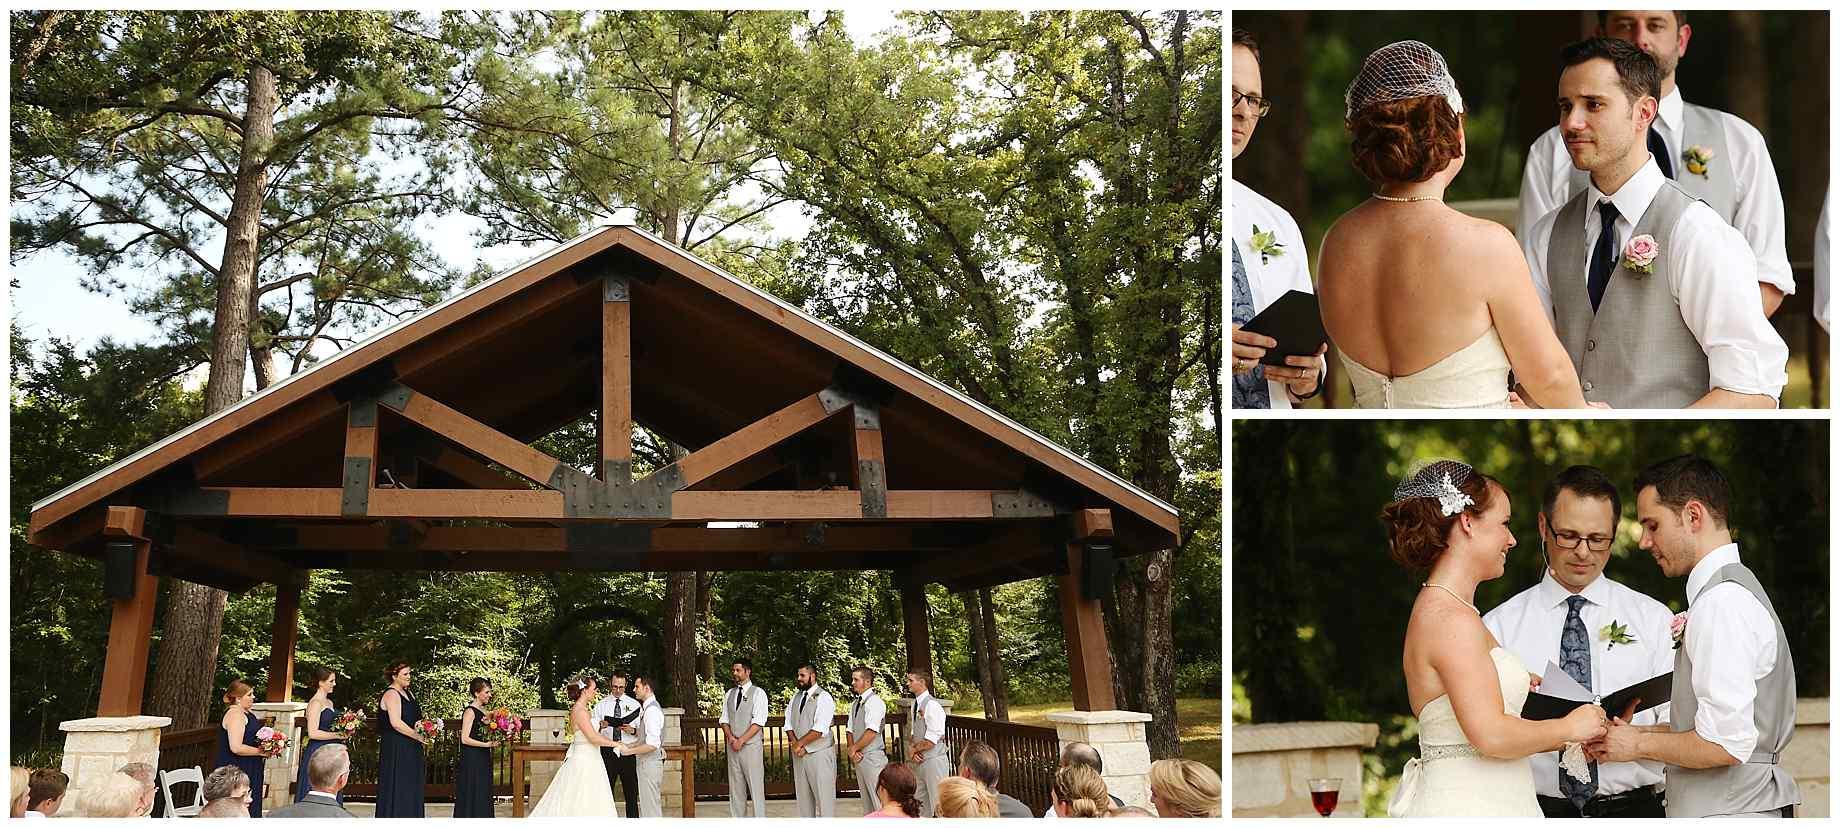 poetry-springs-wedding-photos-021